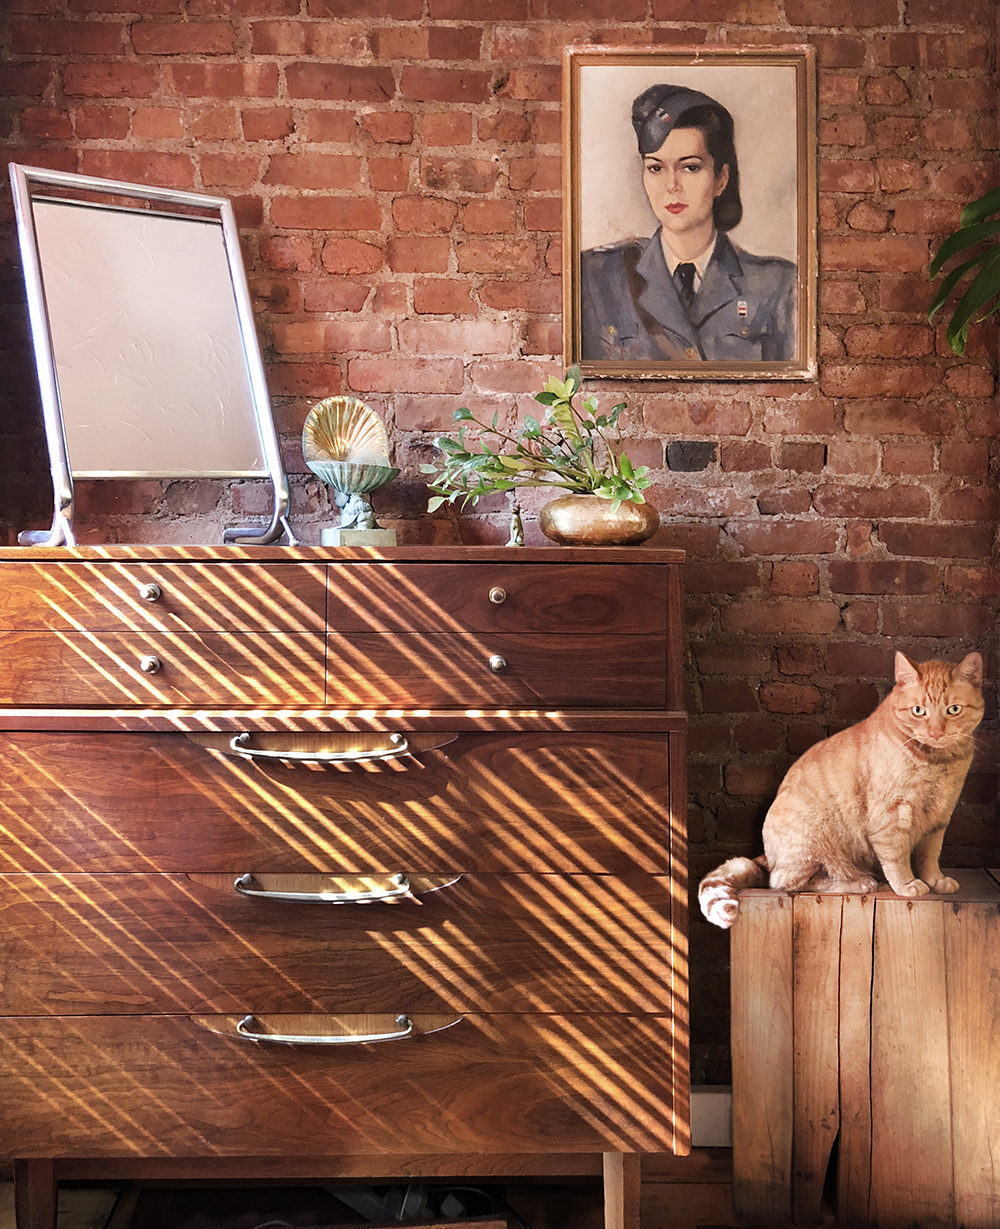 Vintage dresser (1950's), copper jewelry stand, brass pot and original painting by unknown artist. Found orange cat.